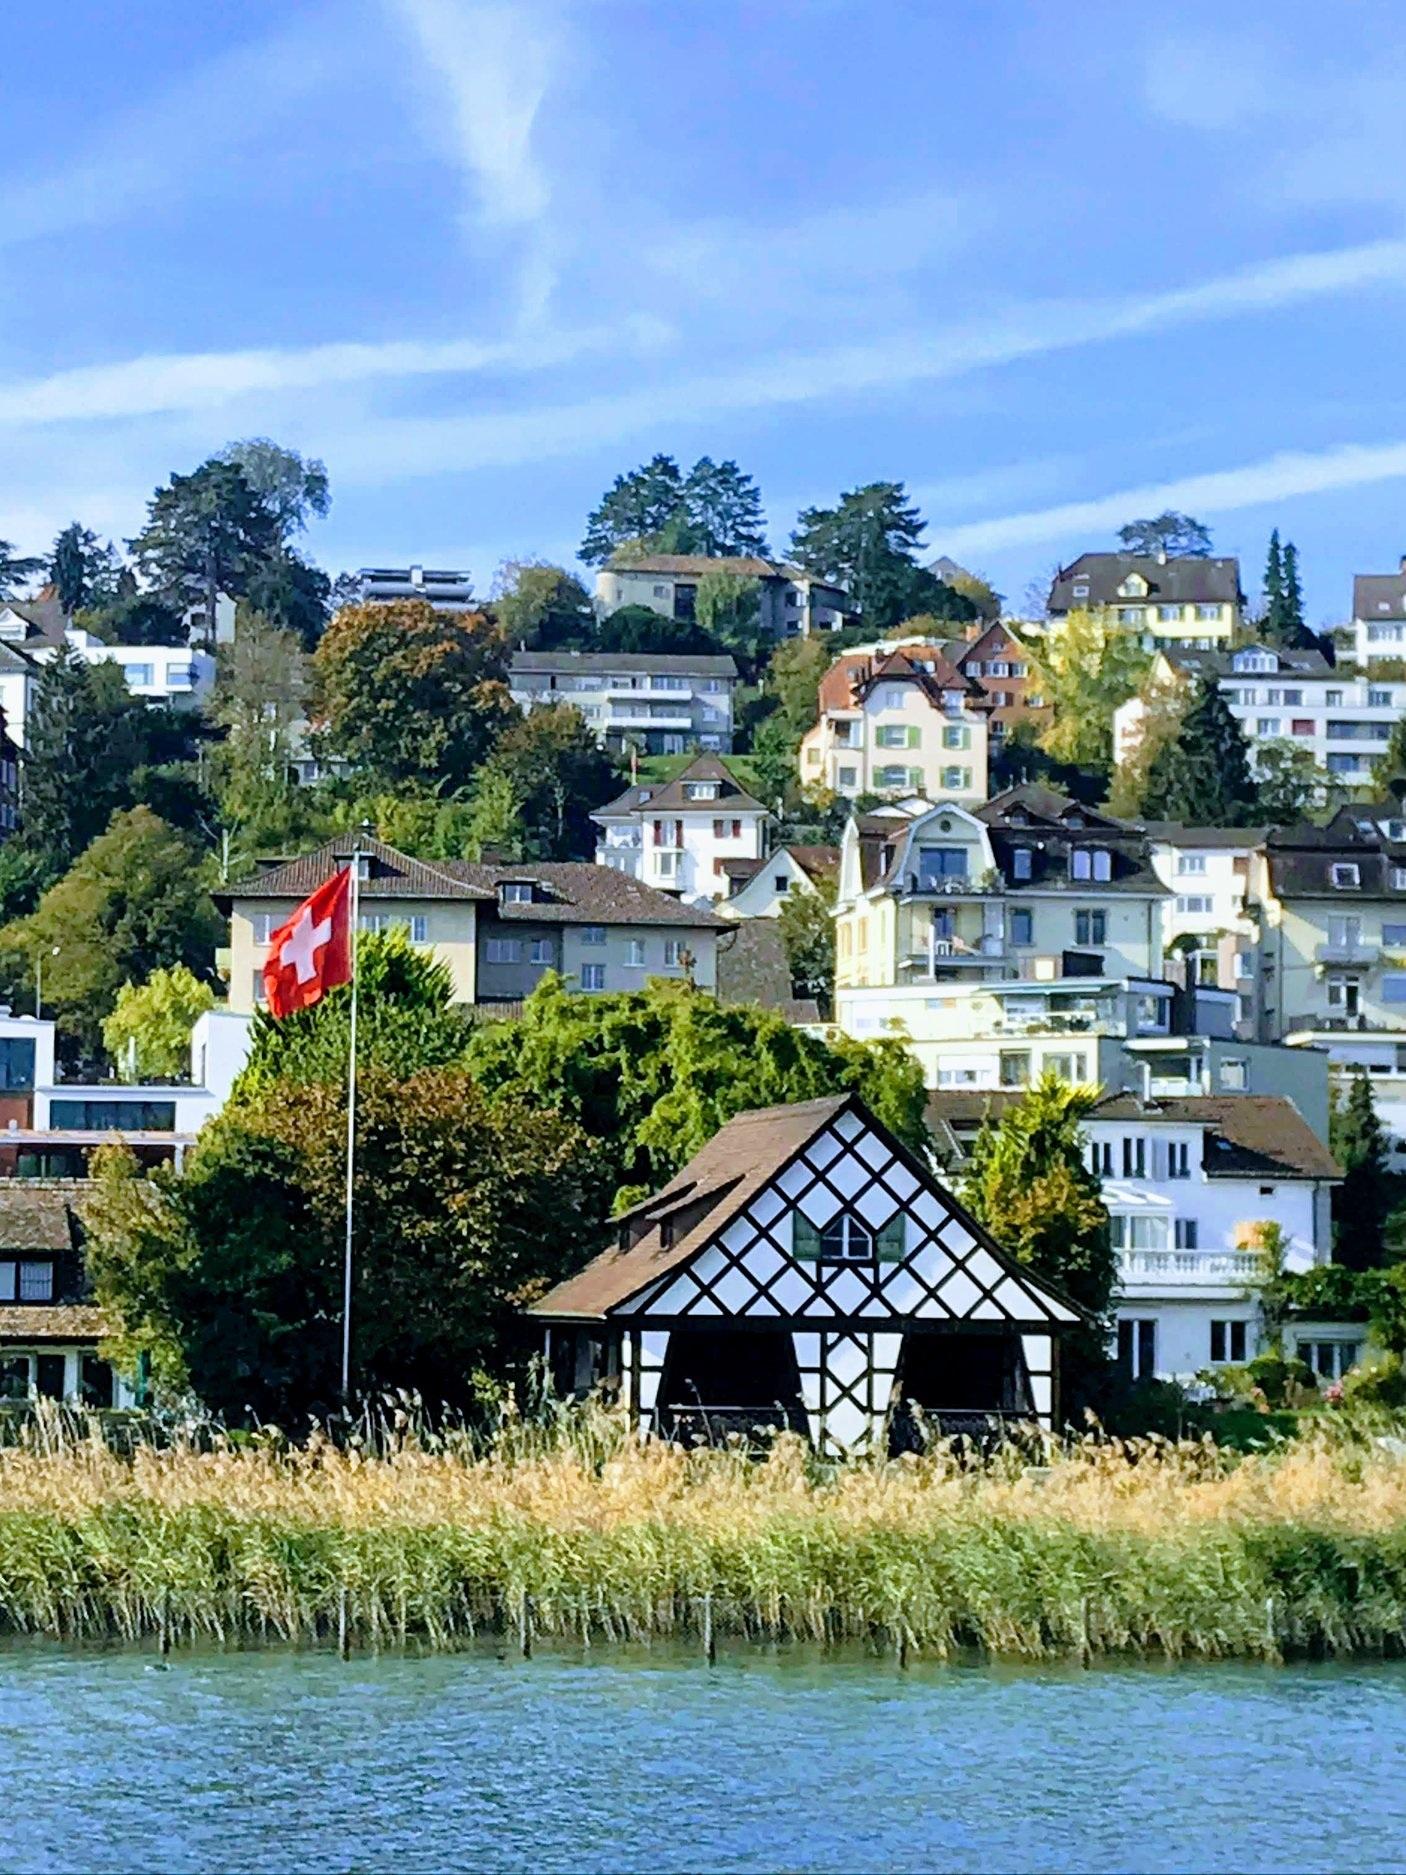 Lakeside houses by Kilchberg in Switzerland